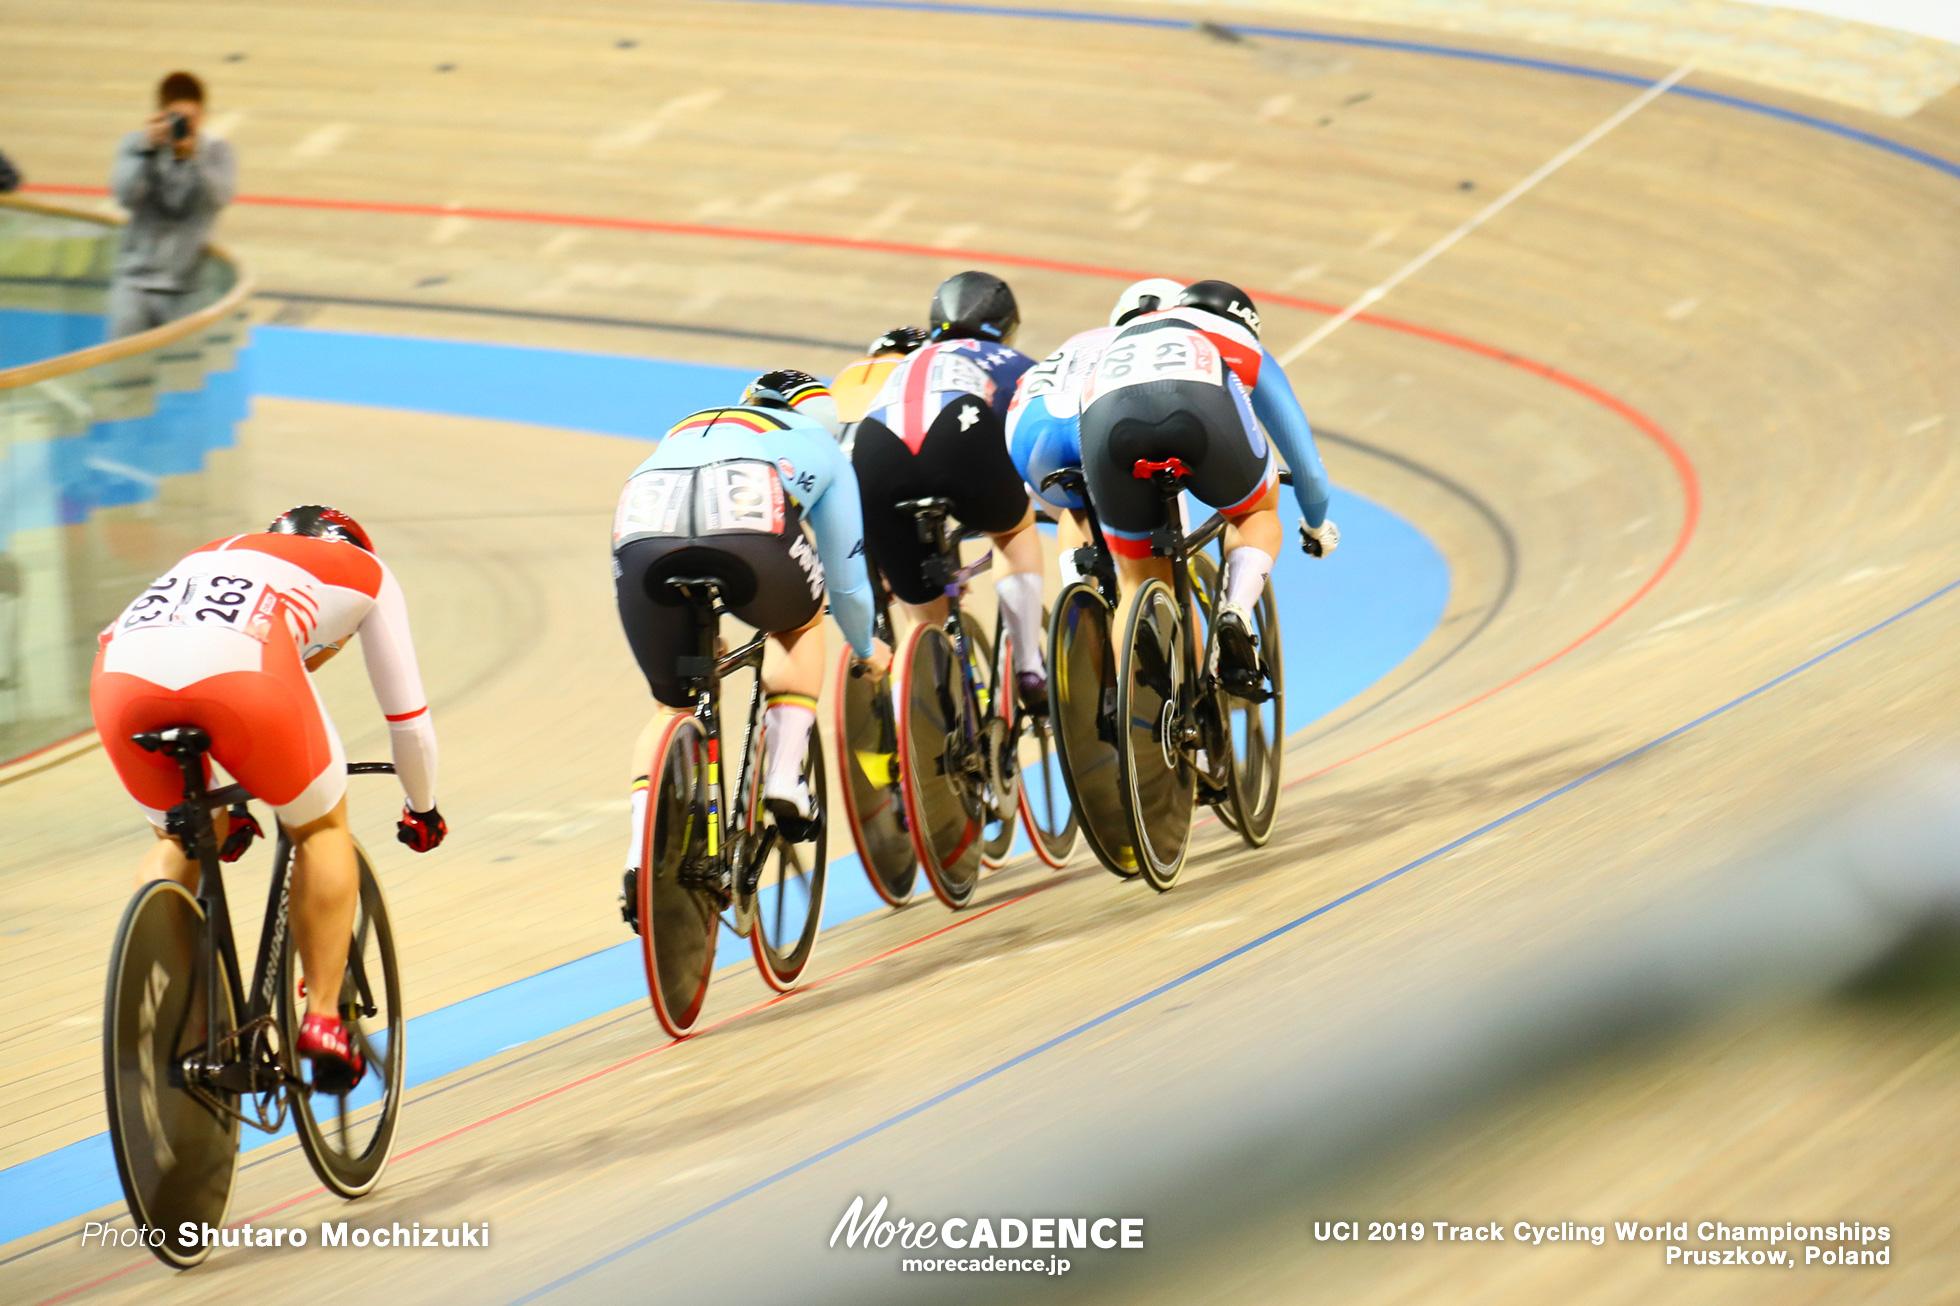 Women's Keirin Semi Final / 2019 Track Cycling World Championships Pruszków, Poland